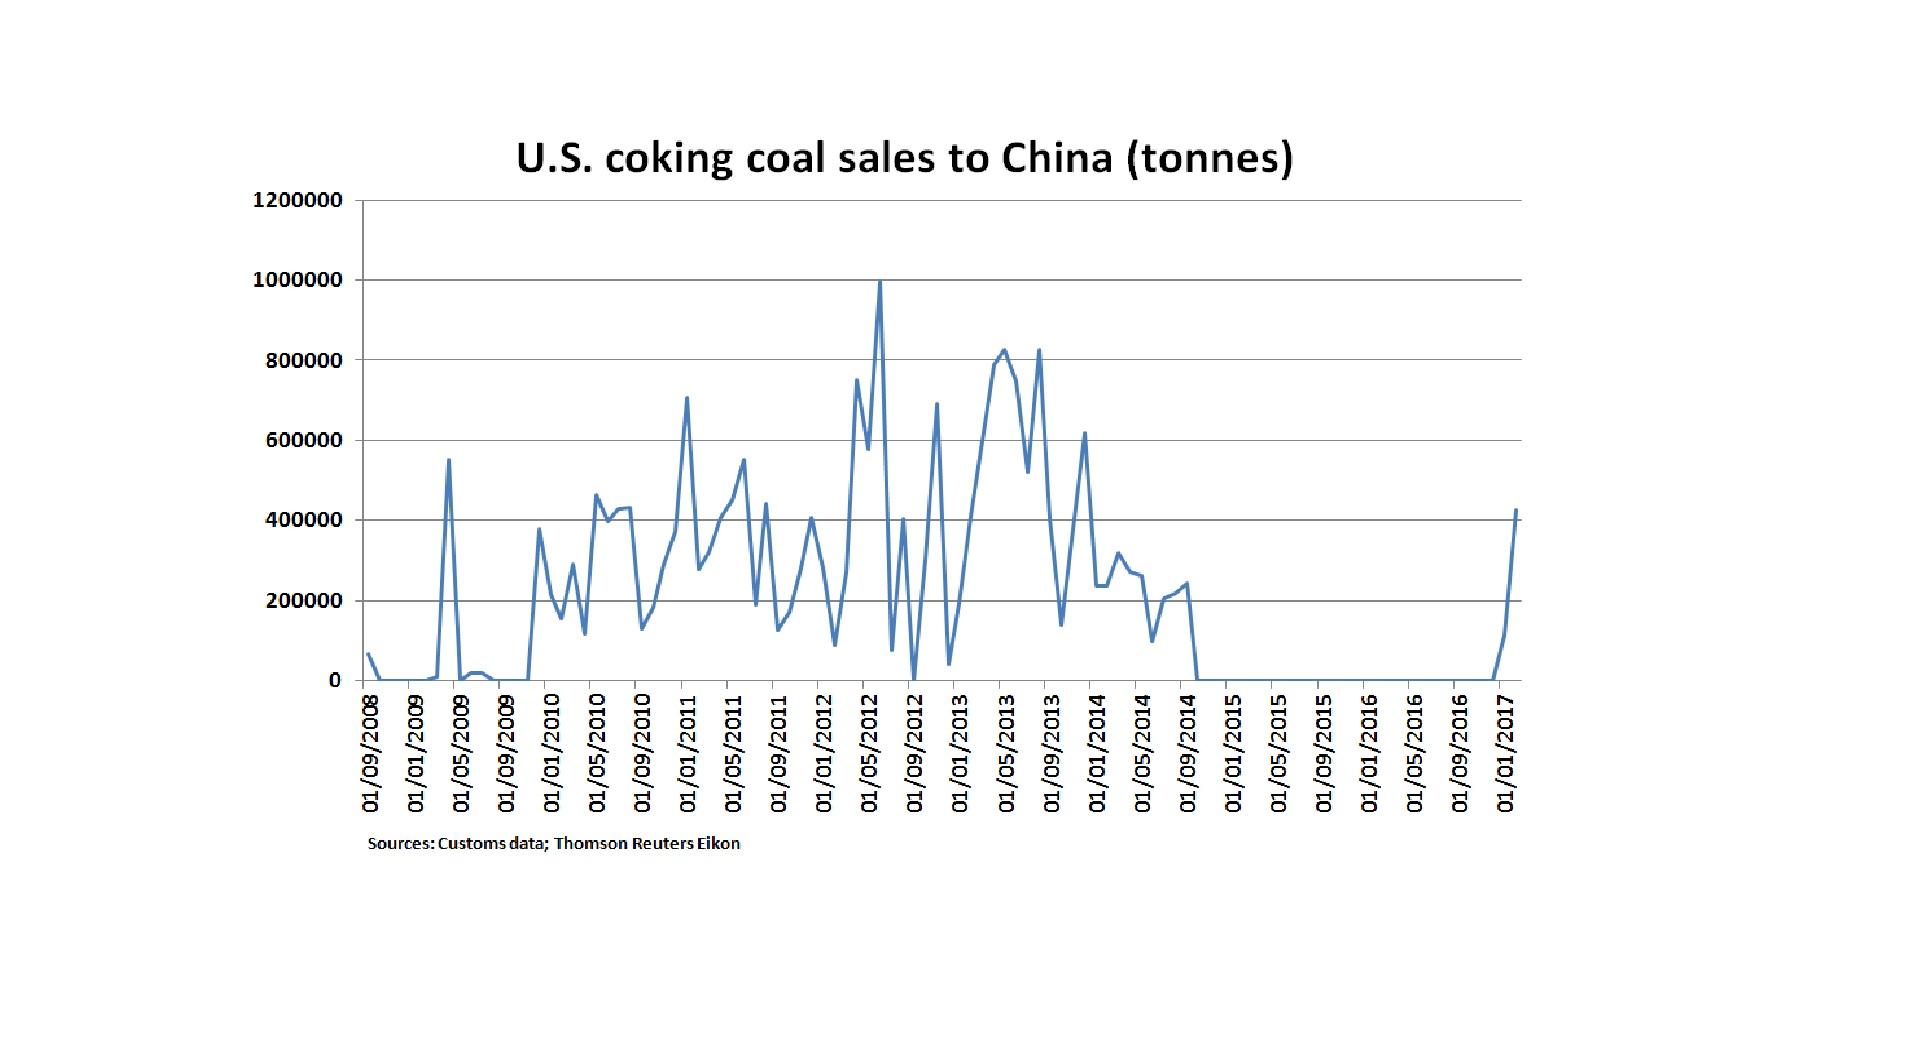 U.S. coking coal exports to China